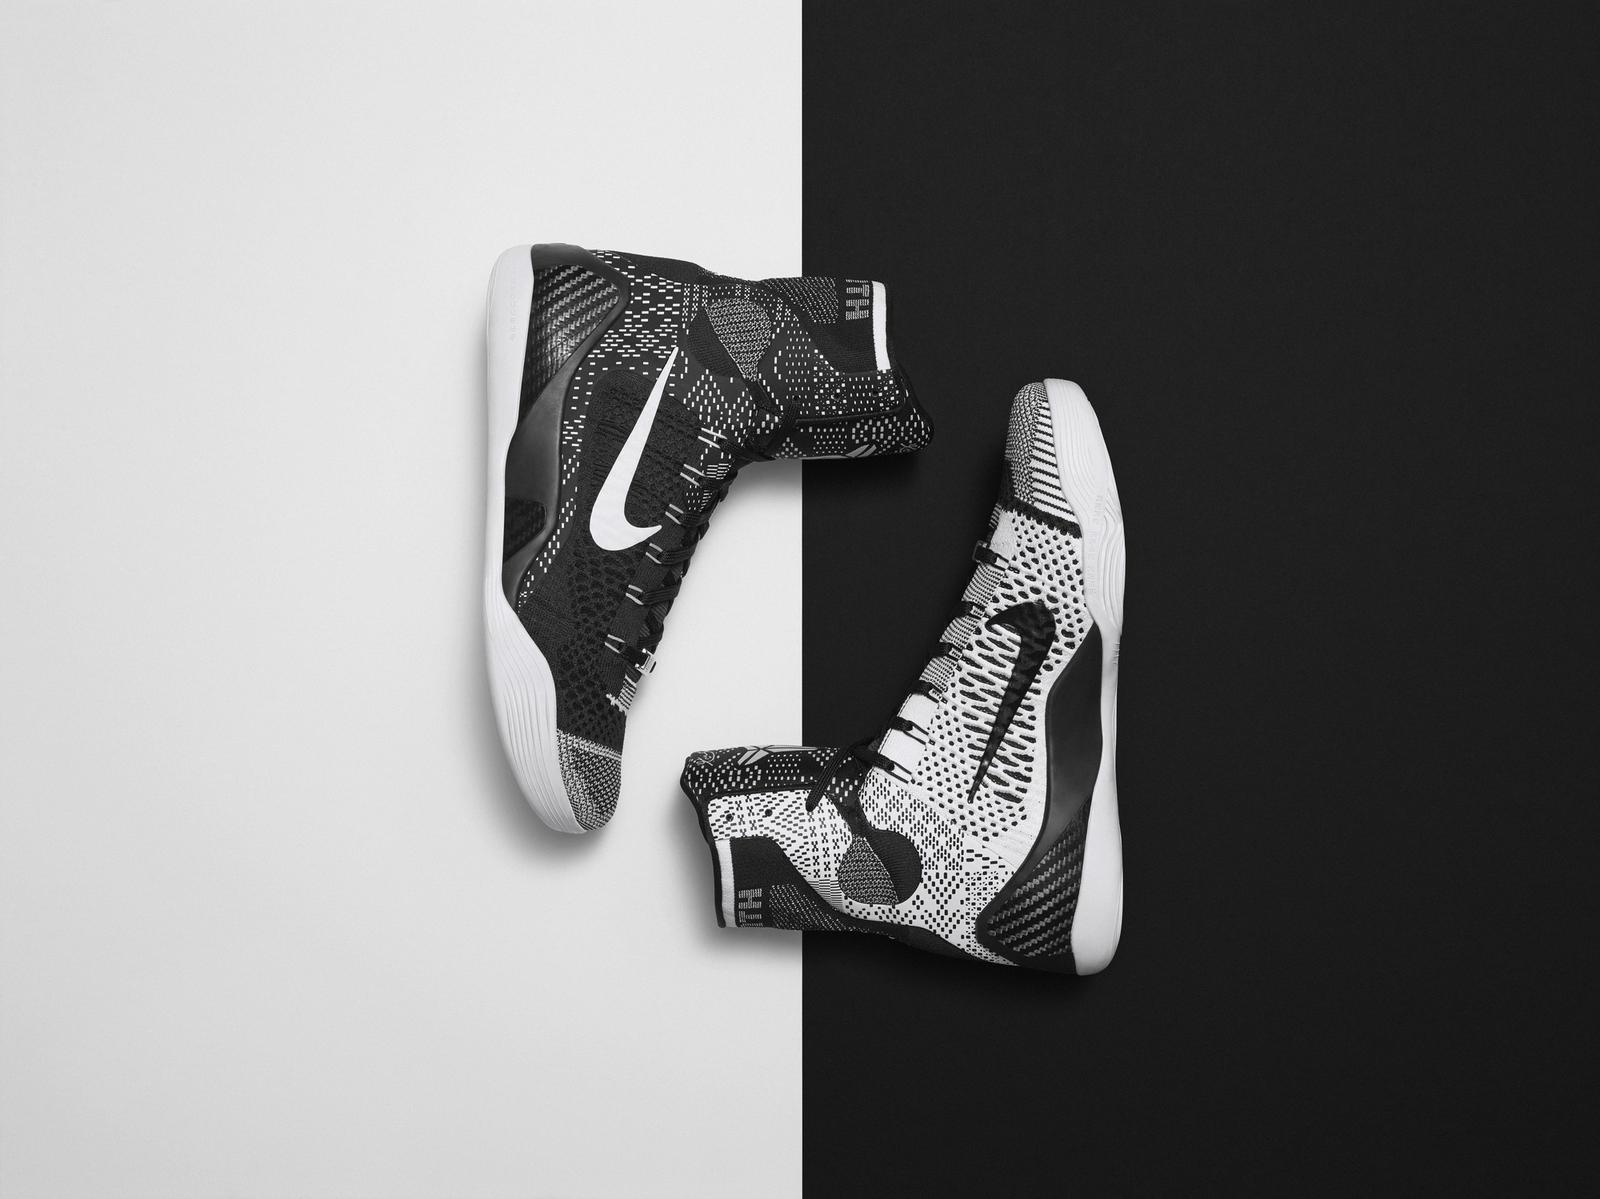 Nike_SP15_BHM_FTWR_KOBE_Final